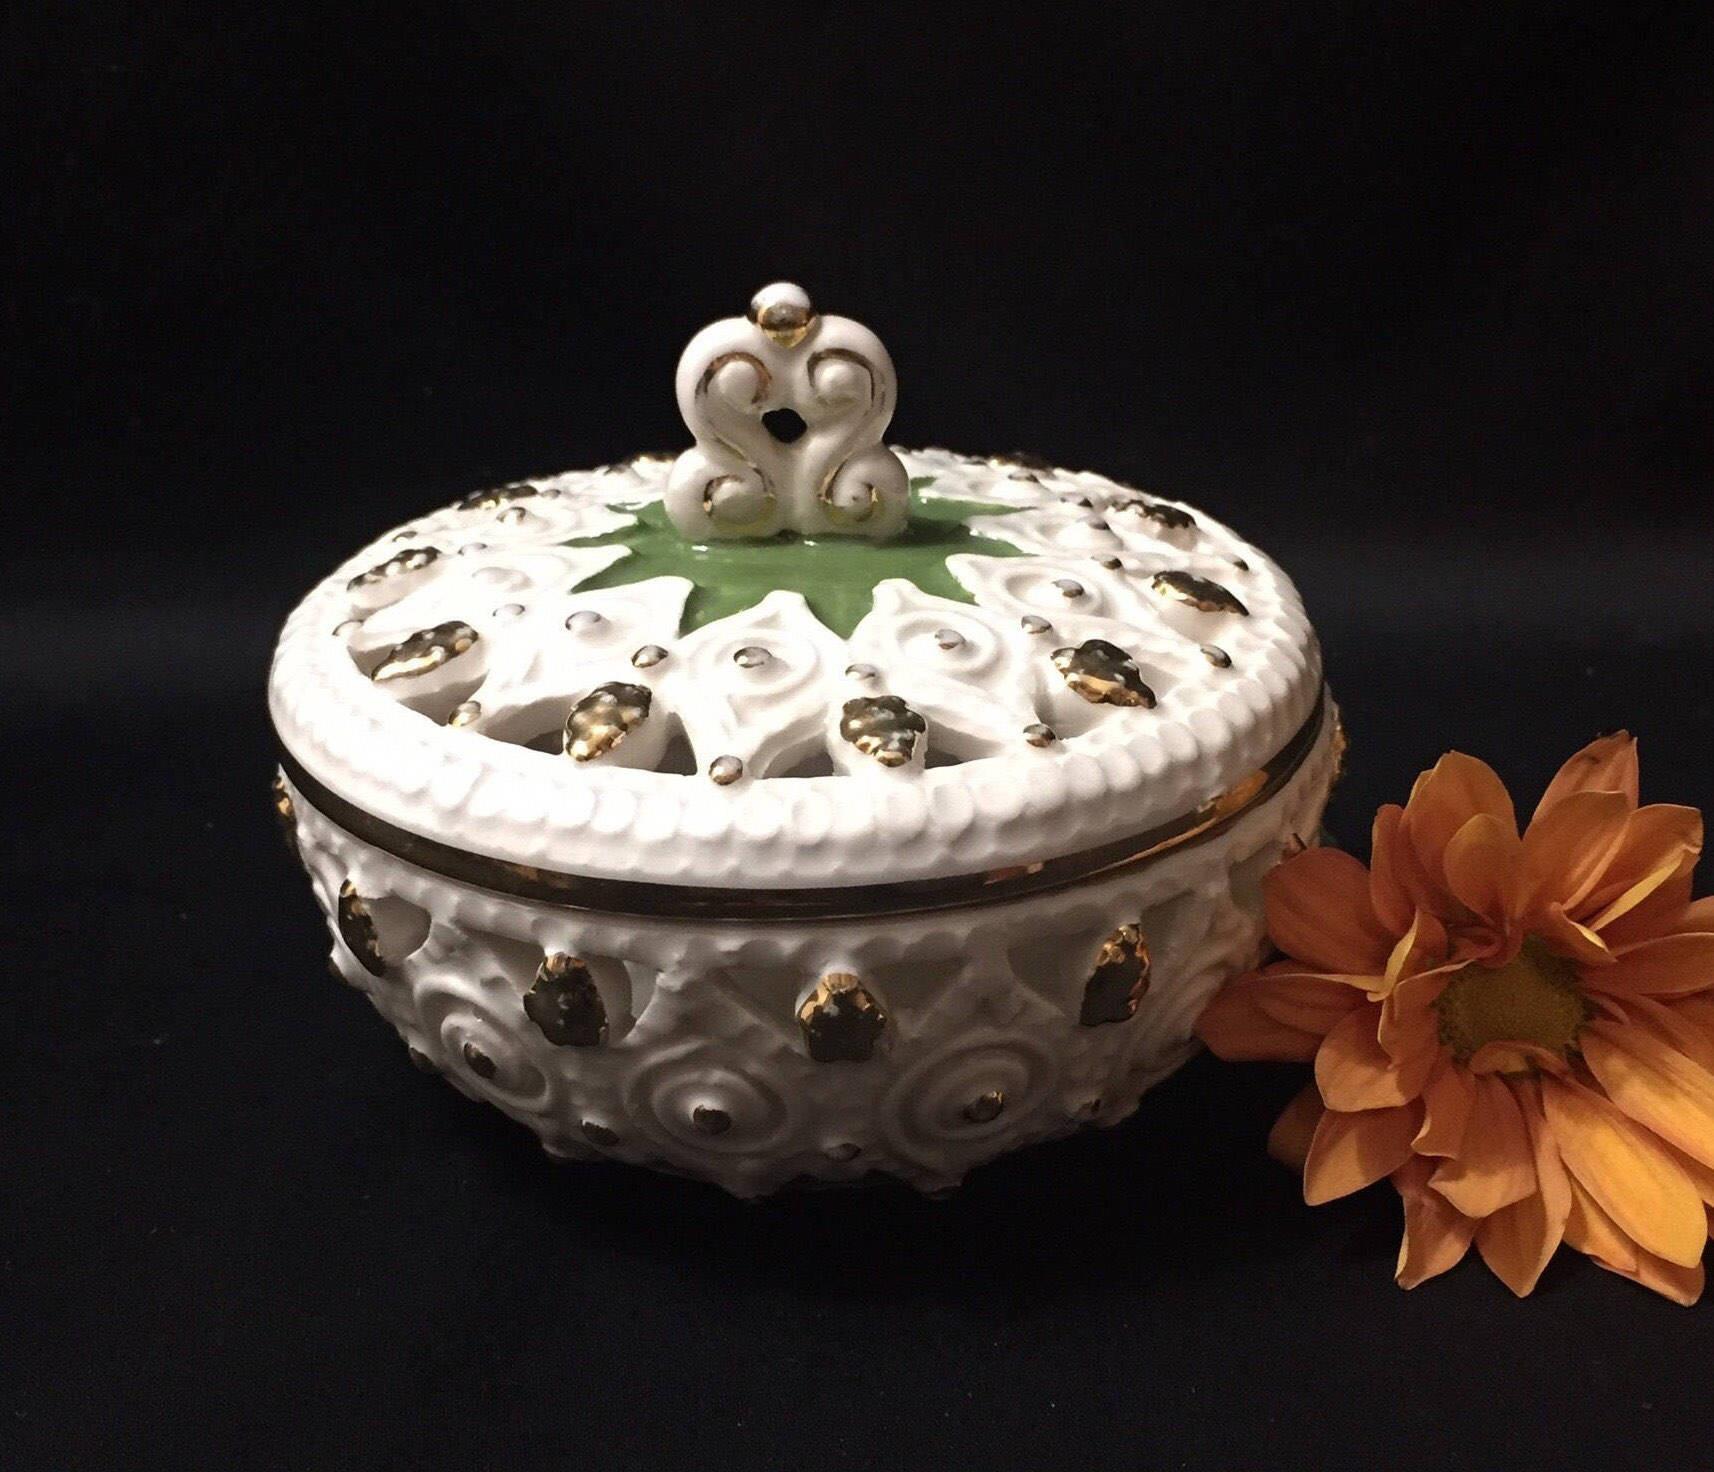 Vintage Italian Pottery Vase Of Vintage Italian Pottery Covered Trinket Dish Koscherak Etsy In Image 0